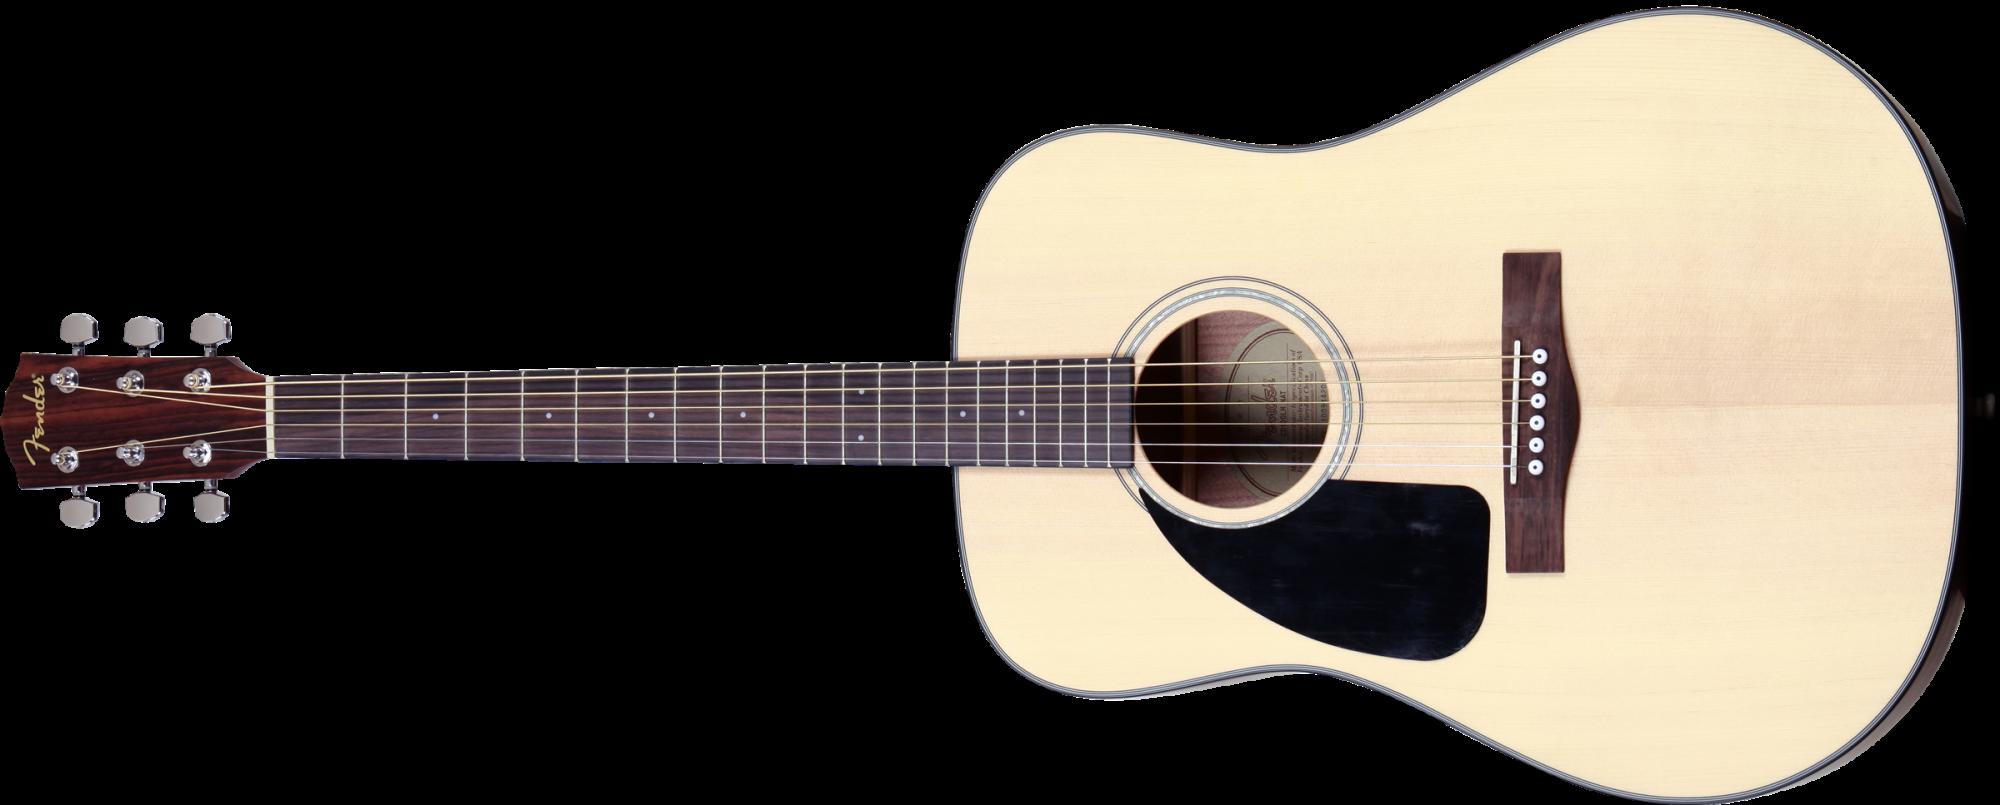 Fender CD-100 LH Dreadnought Acoustic Guitar, Left-Handed